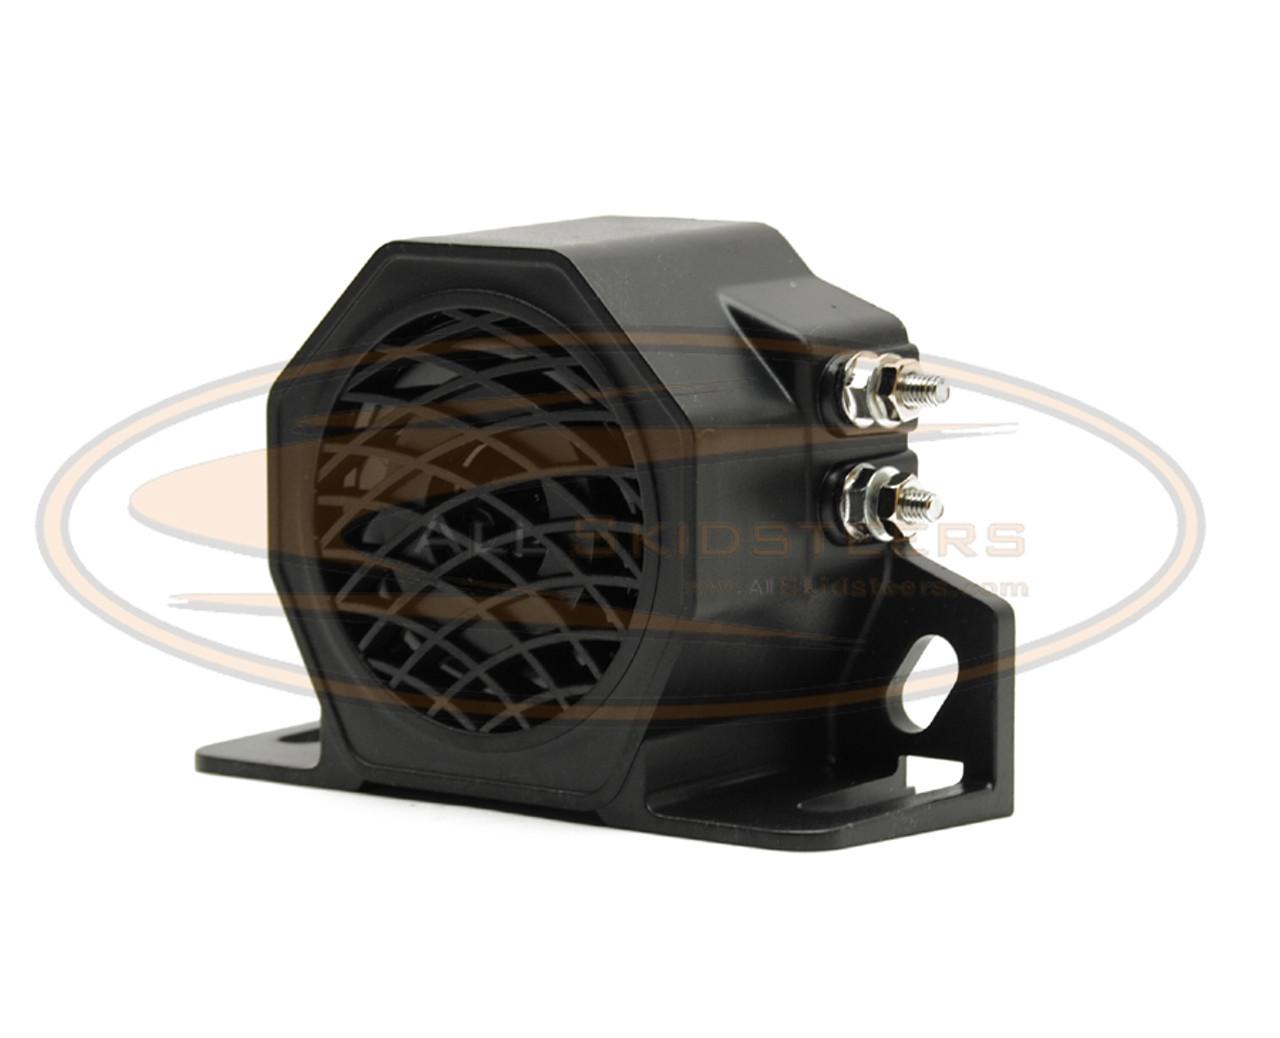 1//2 Flare Nozzle 50X2 mm Pack 2 pc TUBOFLEX 225.10bk Adjustable Coolant Hose